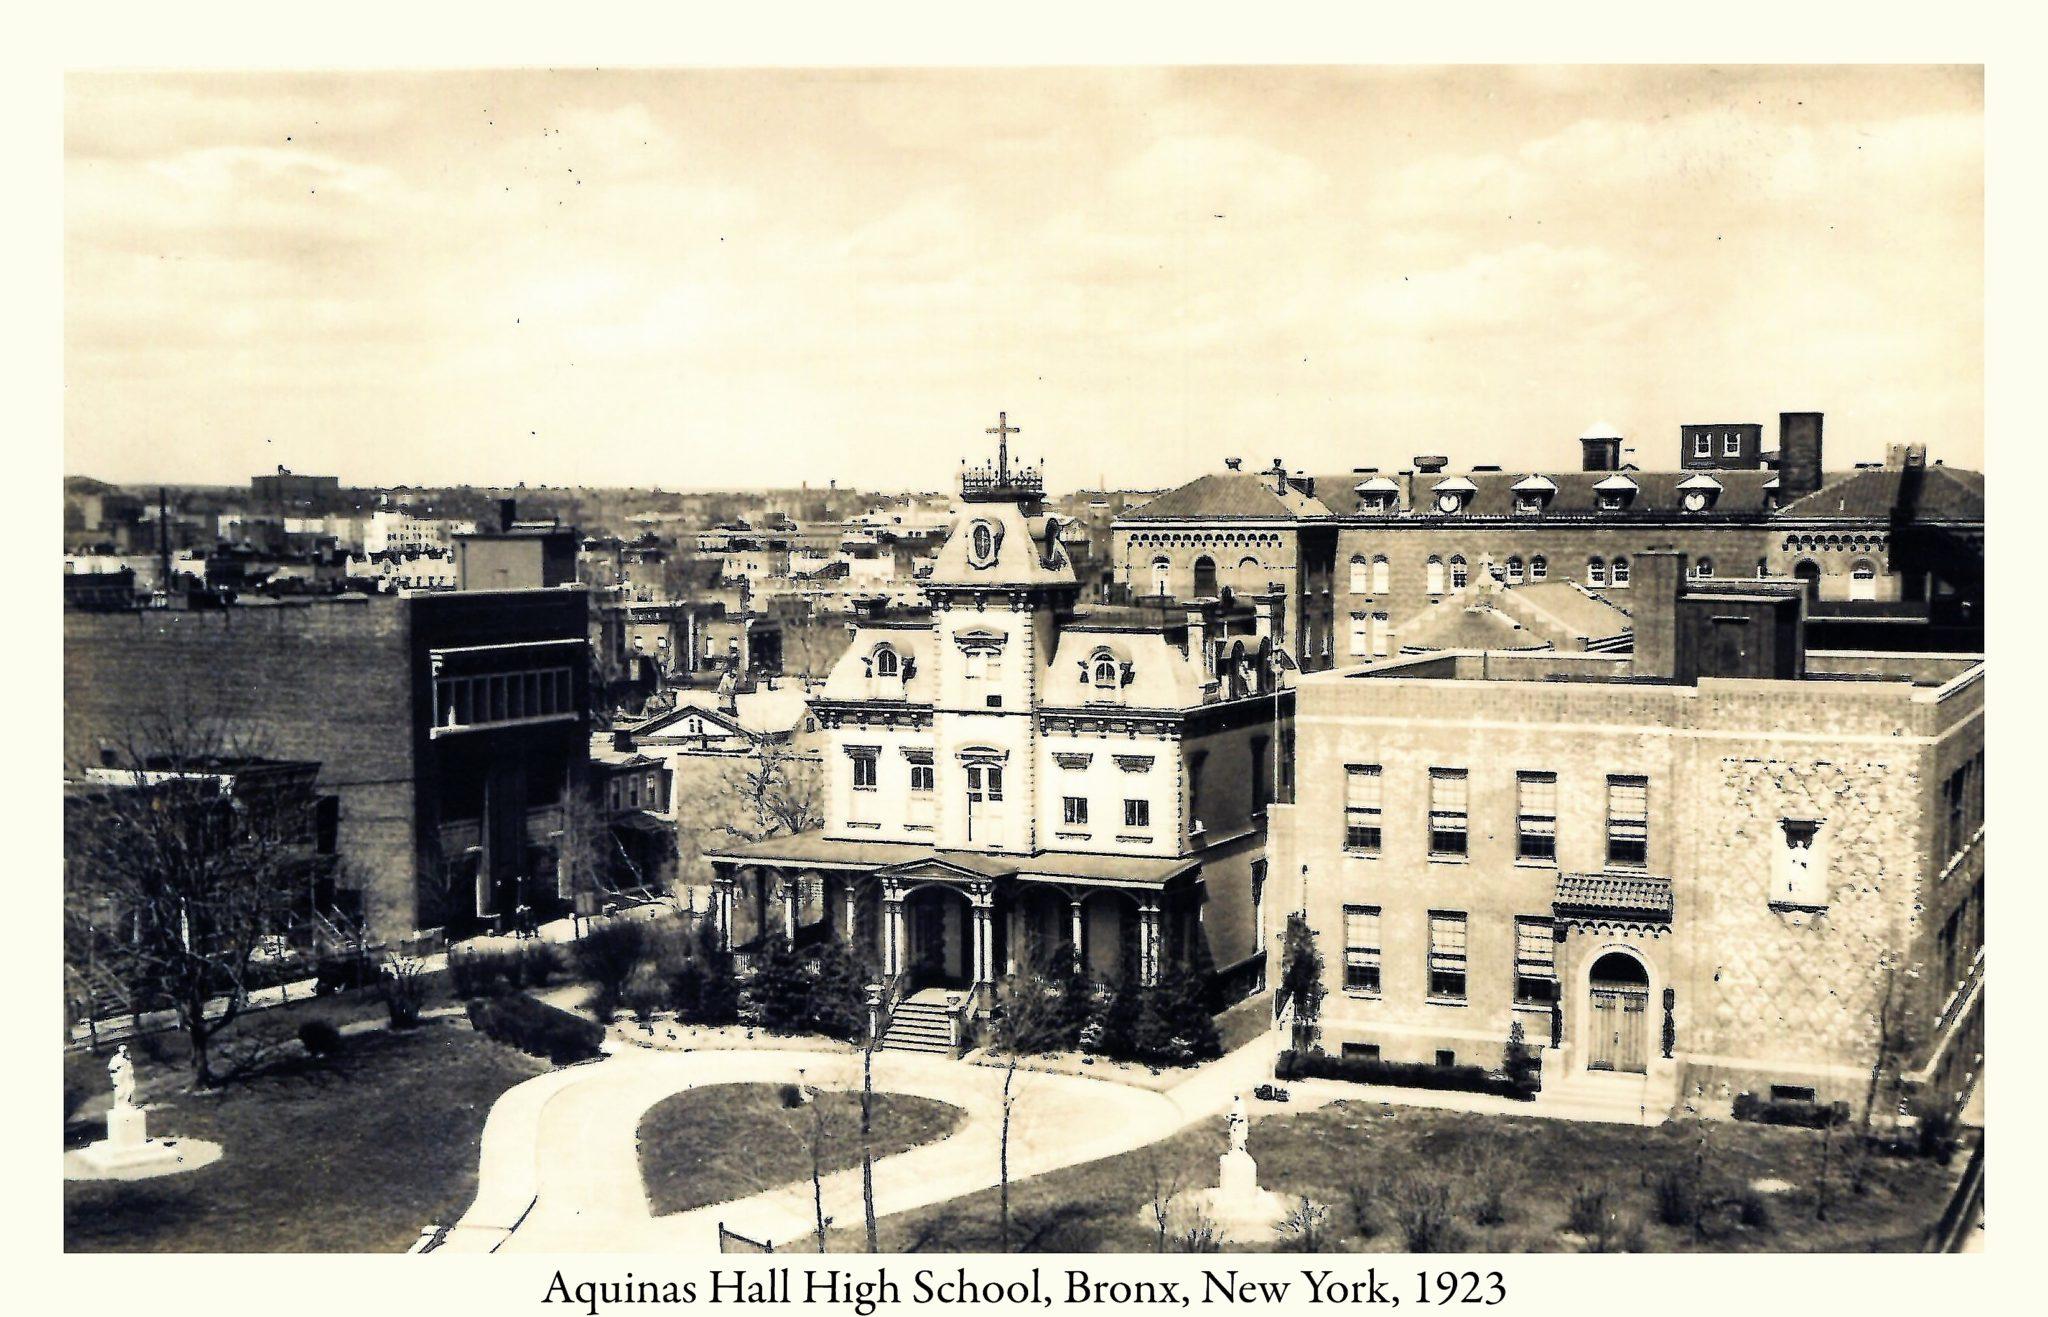 1923 – Opening of Aquinas Hall High School